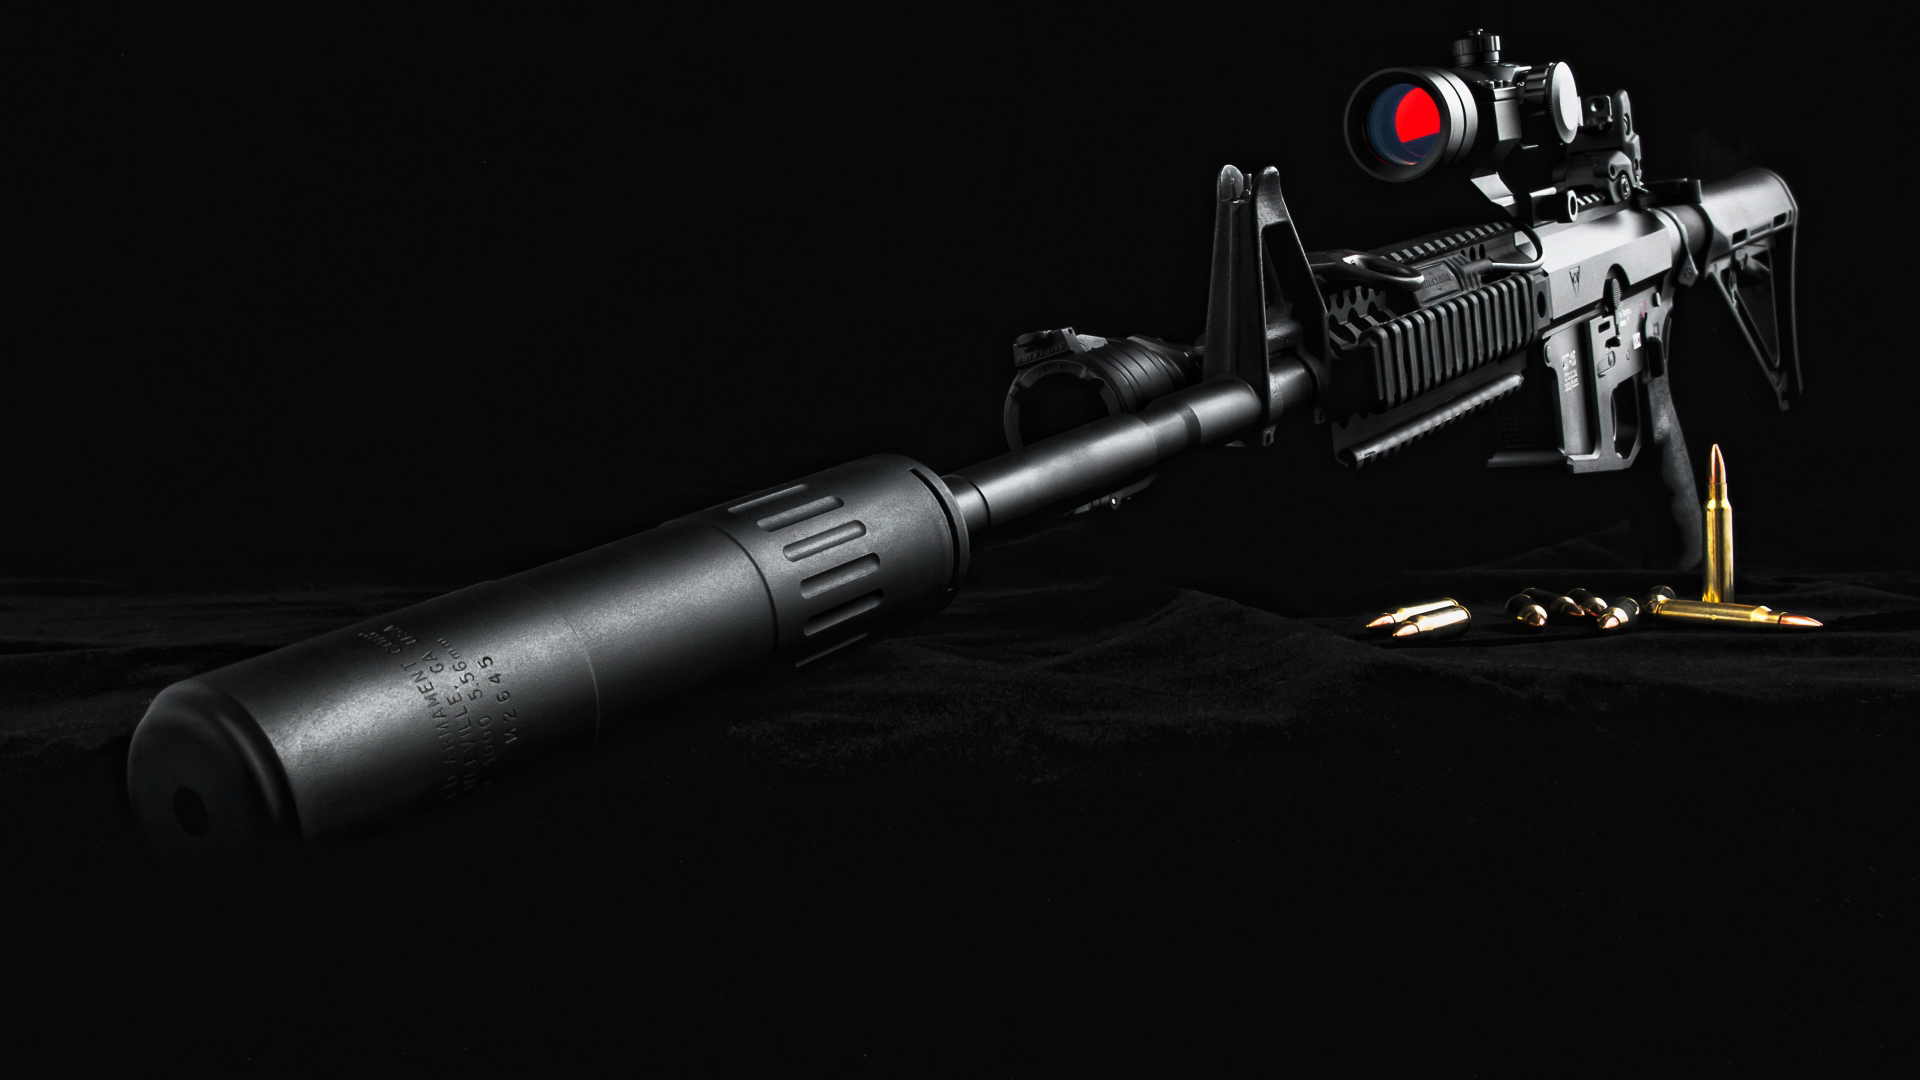 Sniper Rifle Computer Wallpapers Desktop Backgrounds 1920x1080 ID 1920x1080